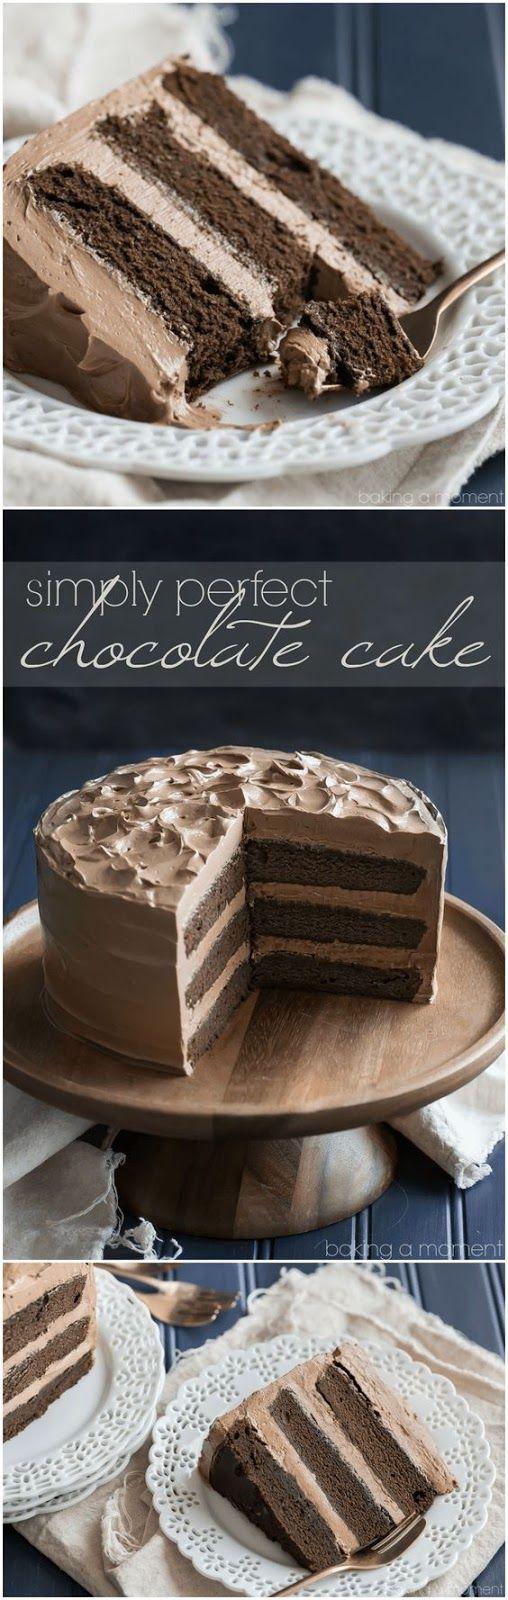 Perfectly moist chocolate cake recipe